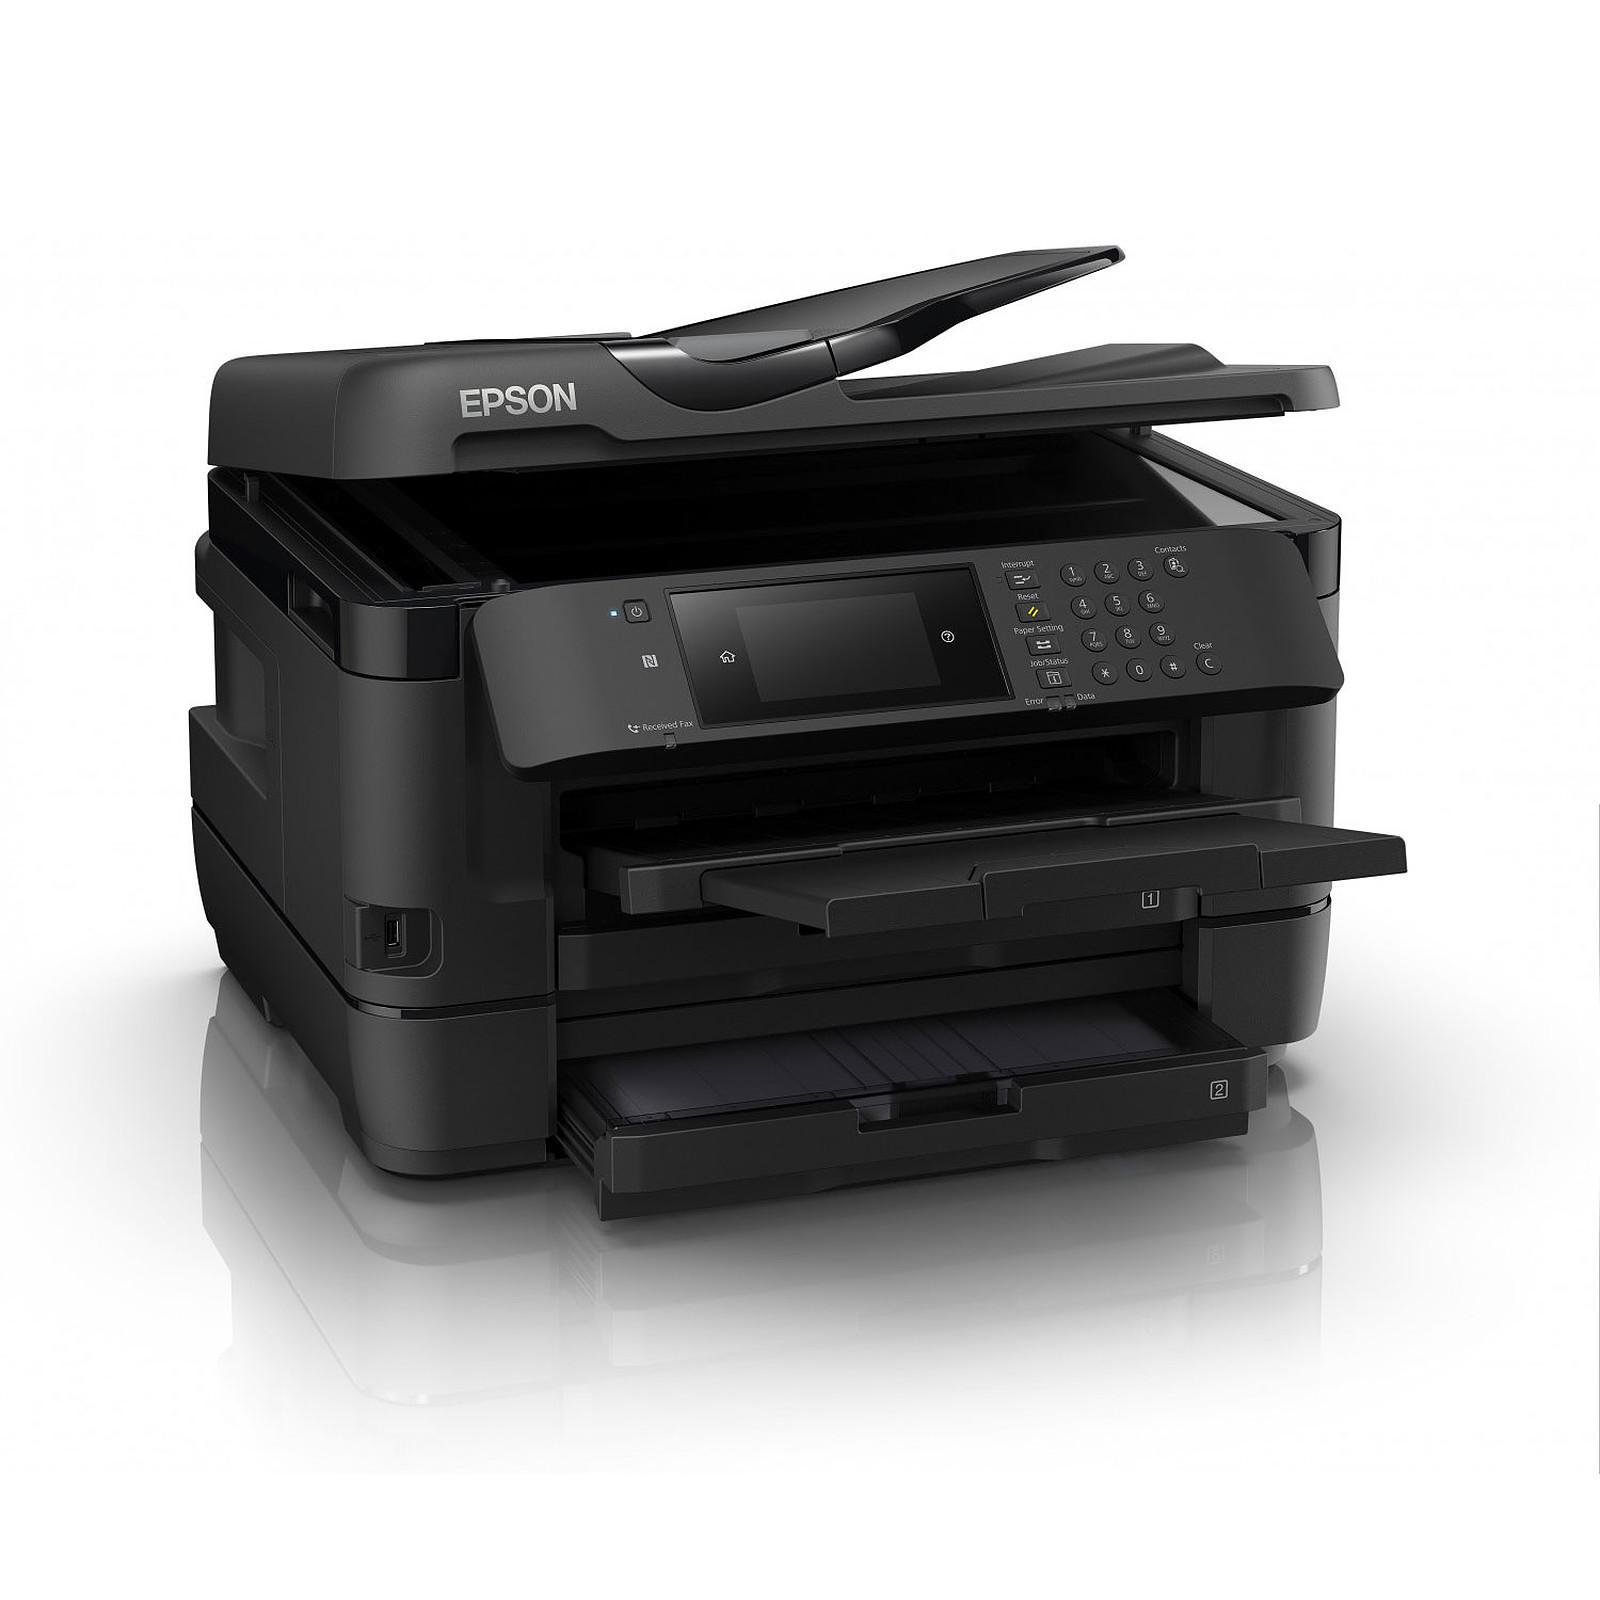 epson workforce wf 7720dtwf imprimante multifonction epson sur. Black Bedroom Furniture Sets. Home Design Ideas